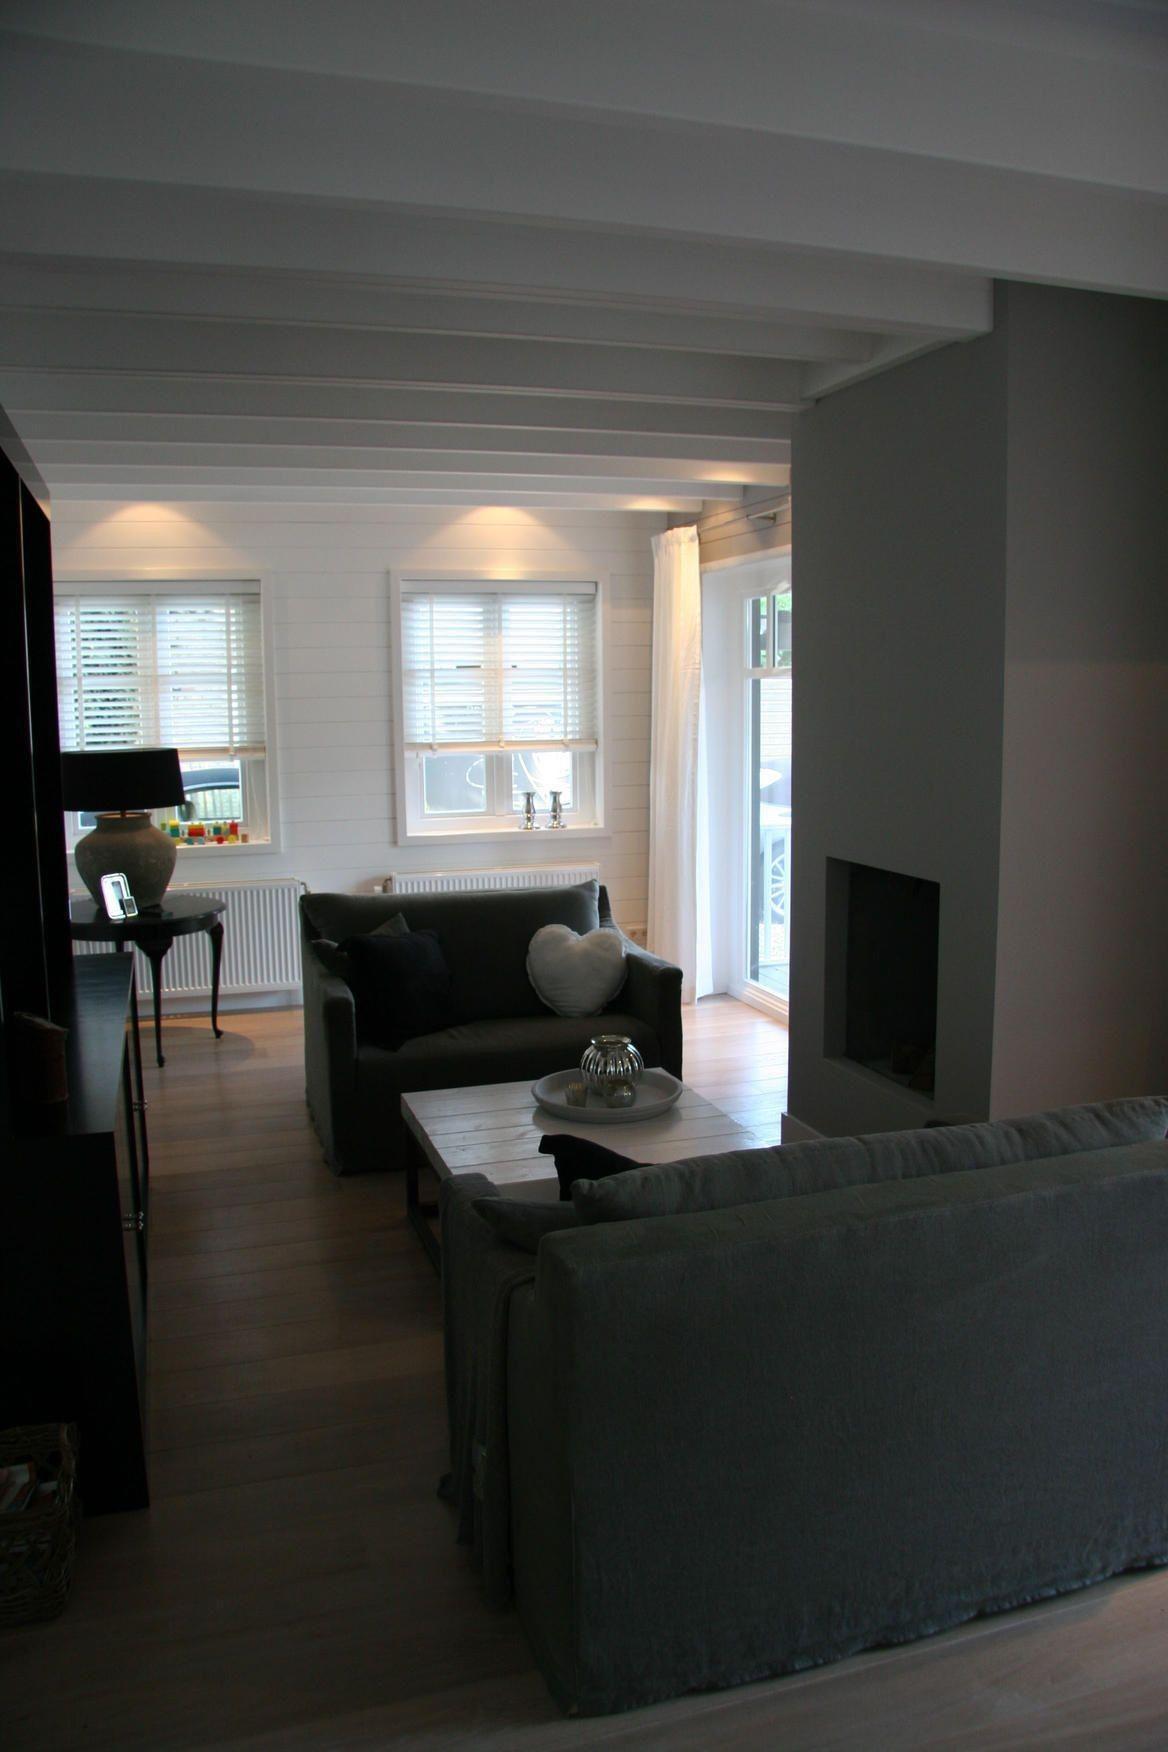 Maison témoin   Kijkwoning Nederland   Mi Casa   Interieur ...